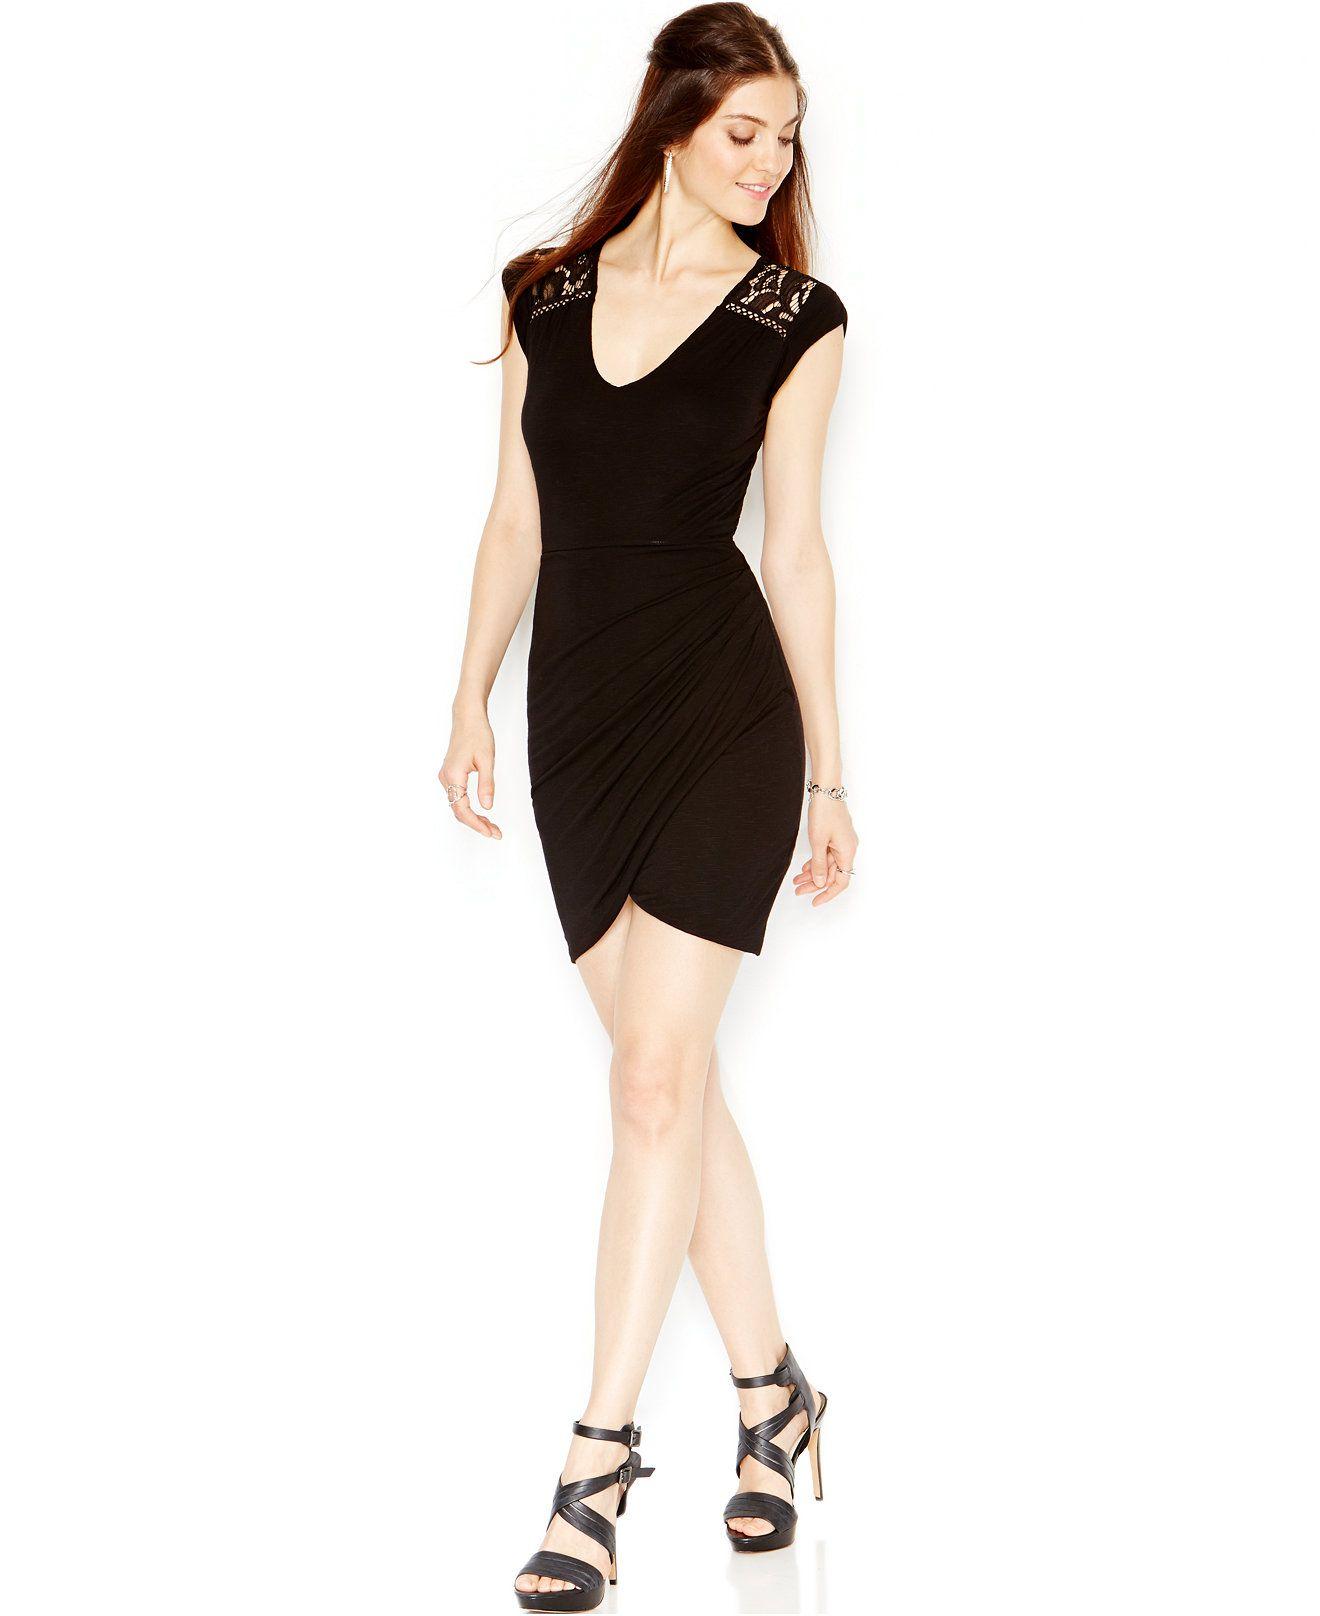 8227add778c GUESS Open-Back Crochet-Inset Bodycon Dress - Juniors Dresses - Macy s